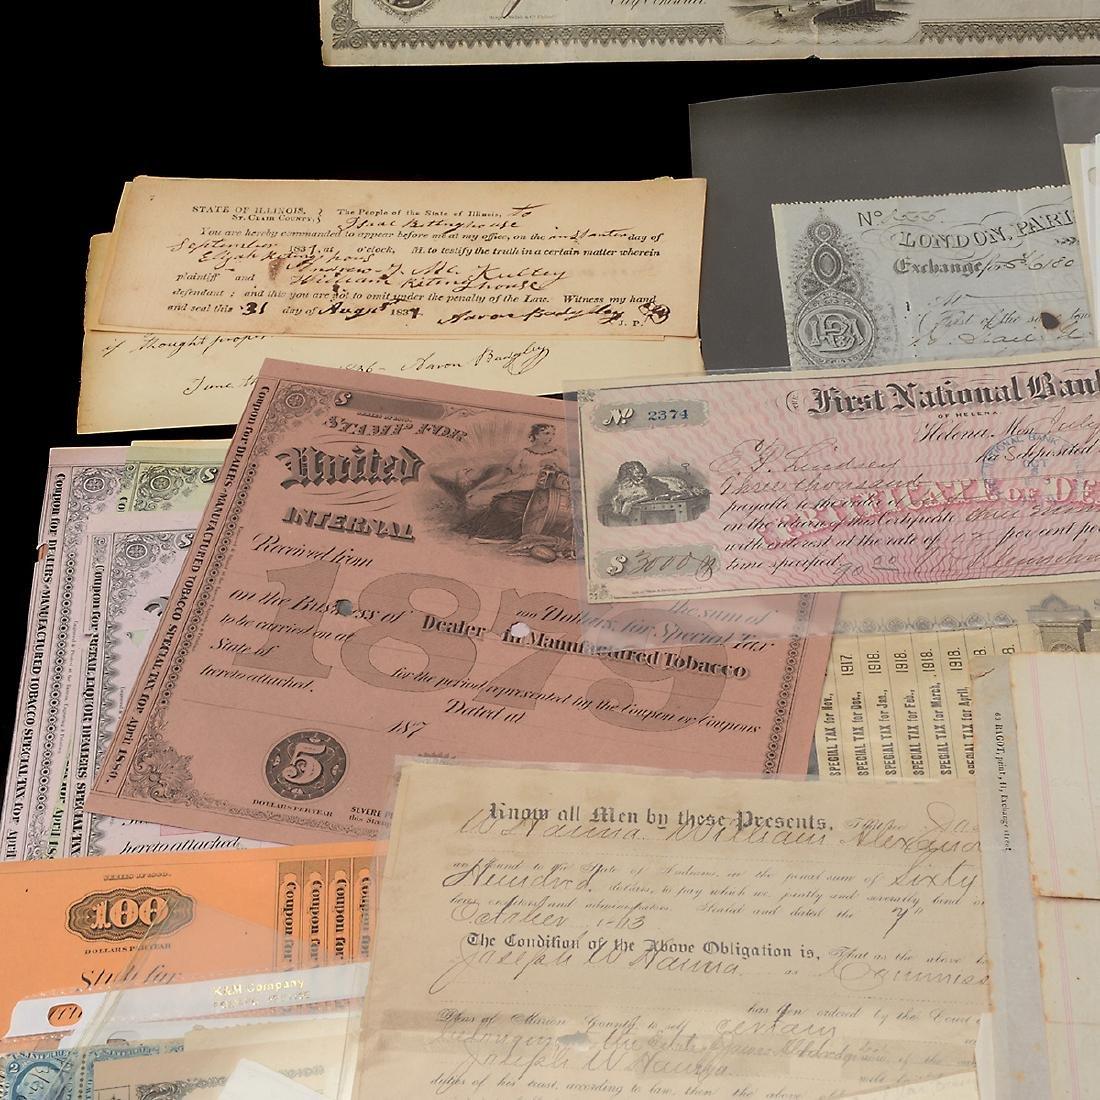 U.S Revenue Papers & Checks, 19th Century (100) - 3